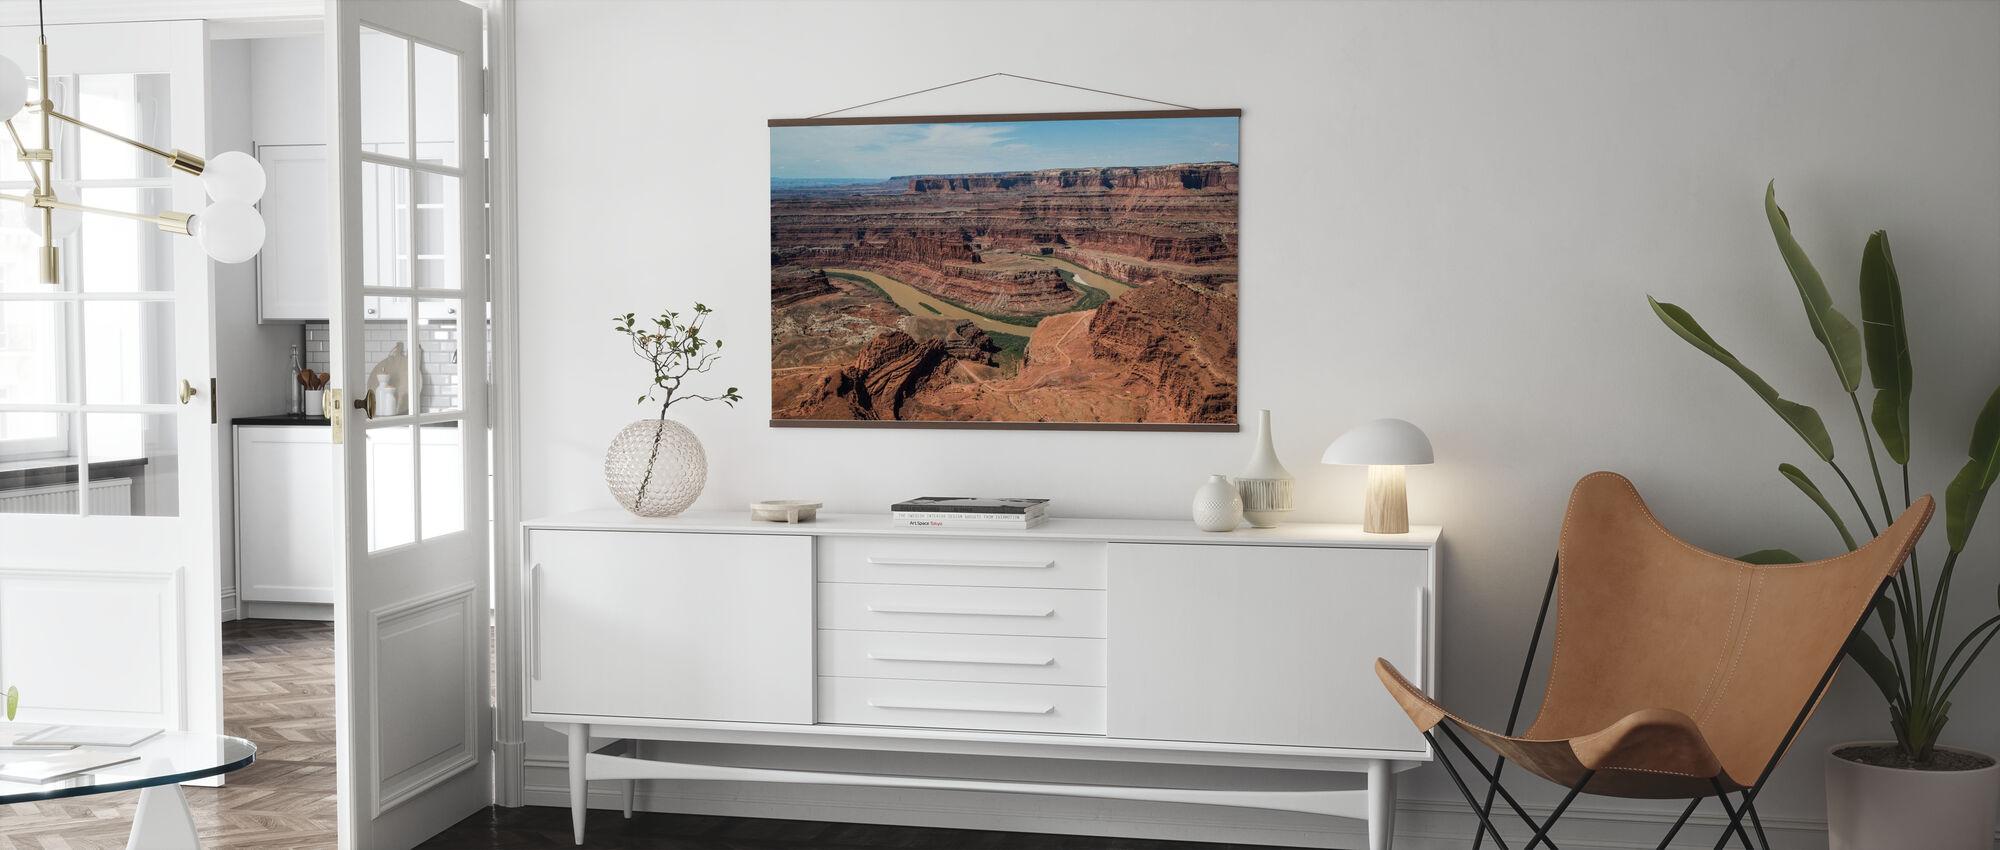 Dead Horsepoint Perspective of Gooseneck Color - Poster - Living Room